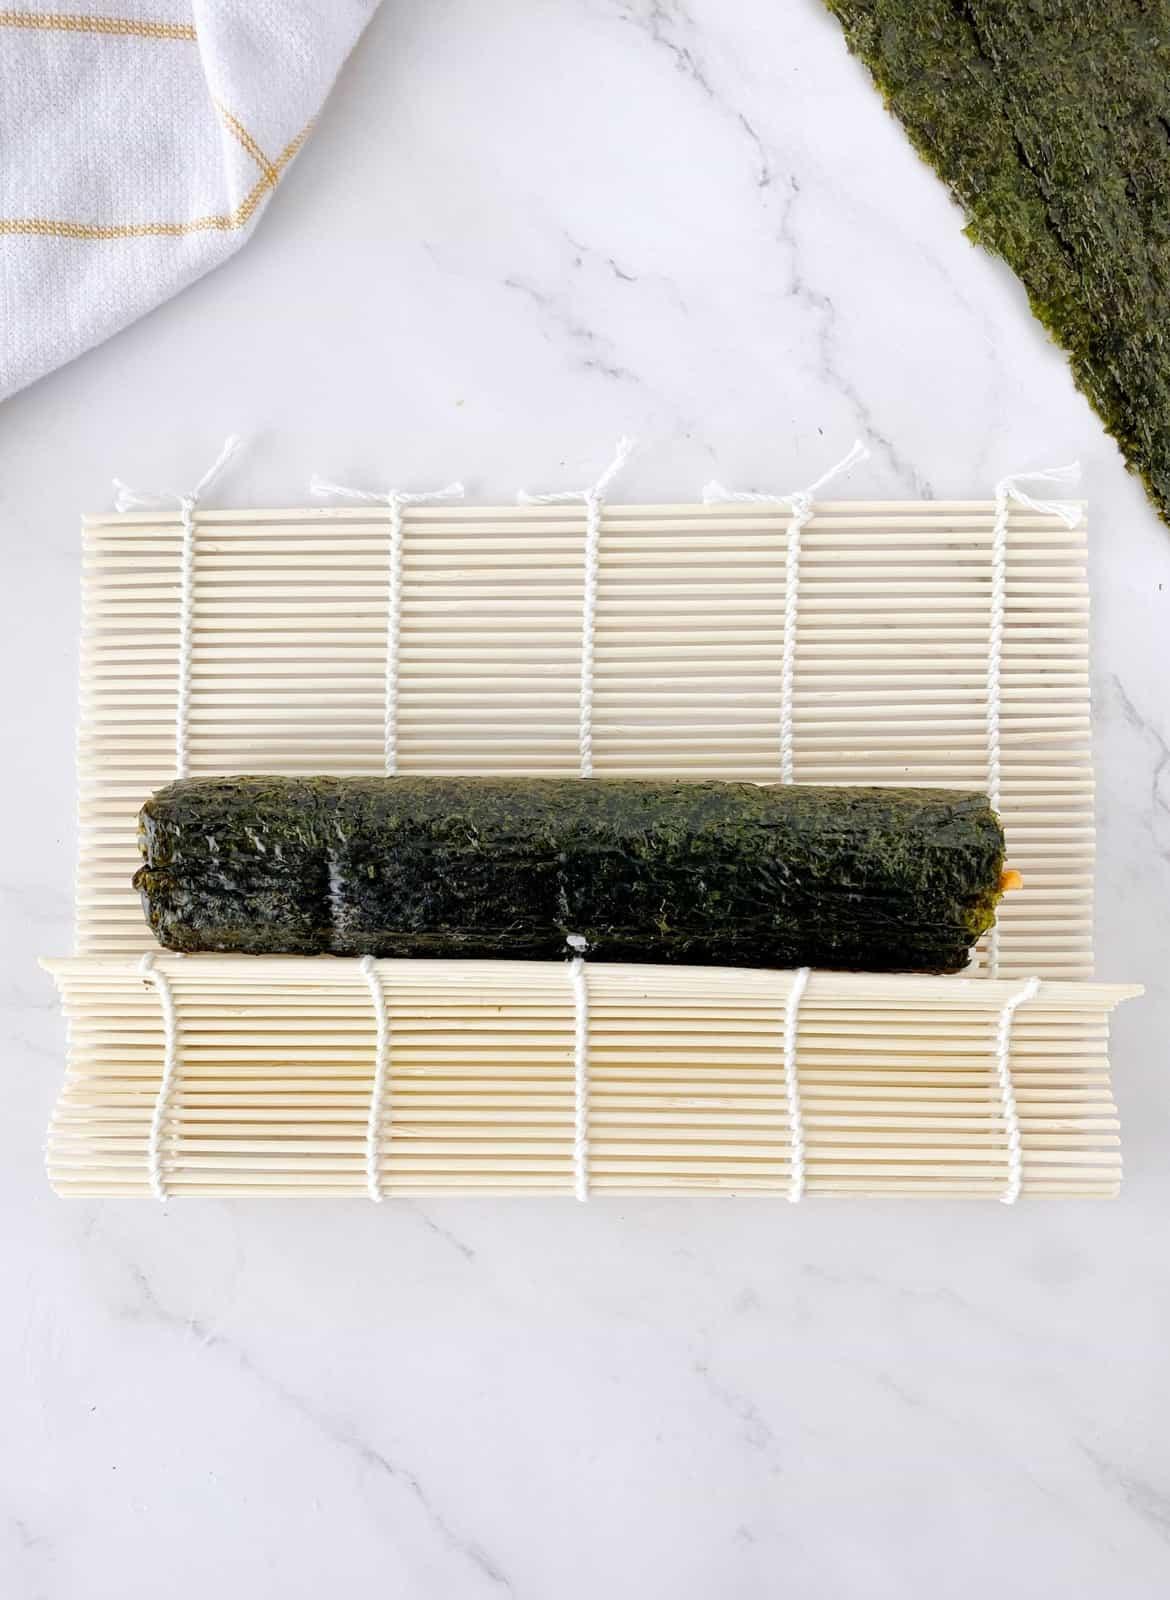 sewaweed roll on a sushi mat